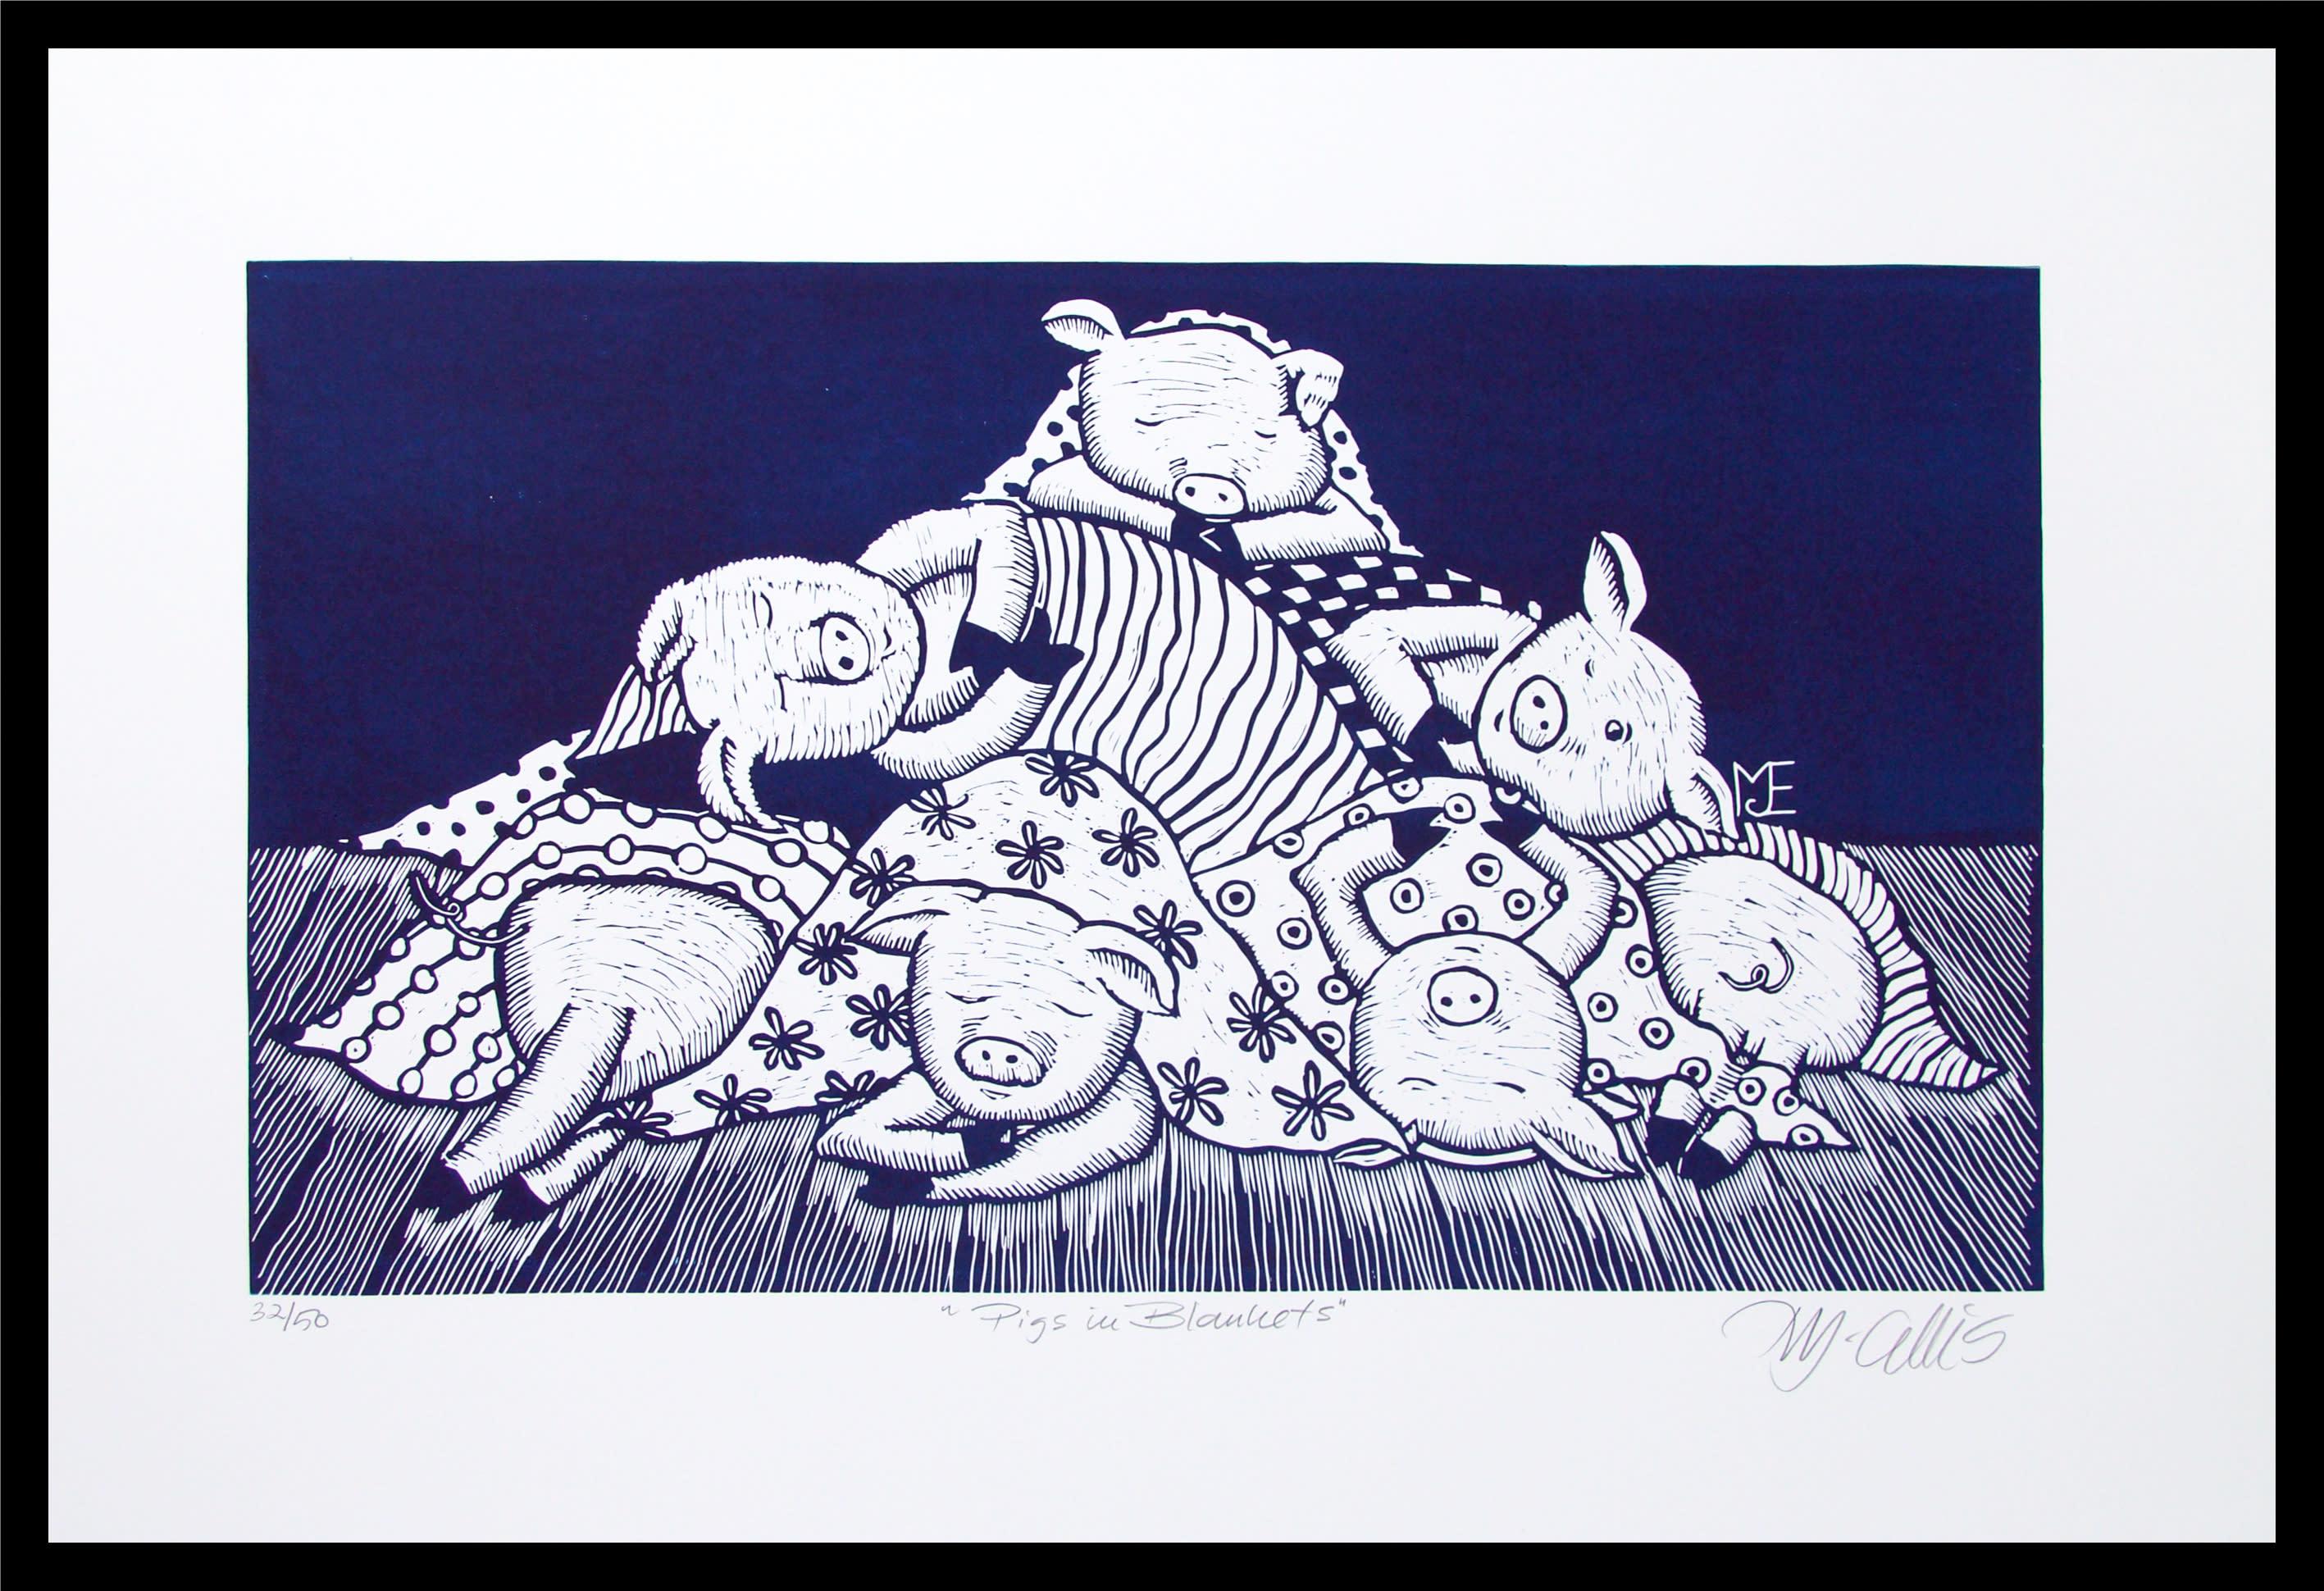 Pigs in blankets navy framed qxotnm